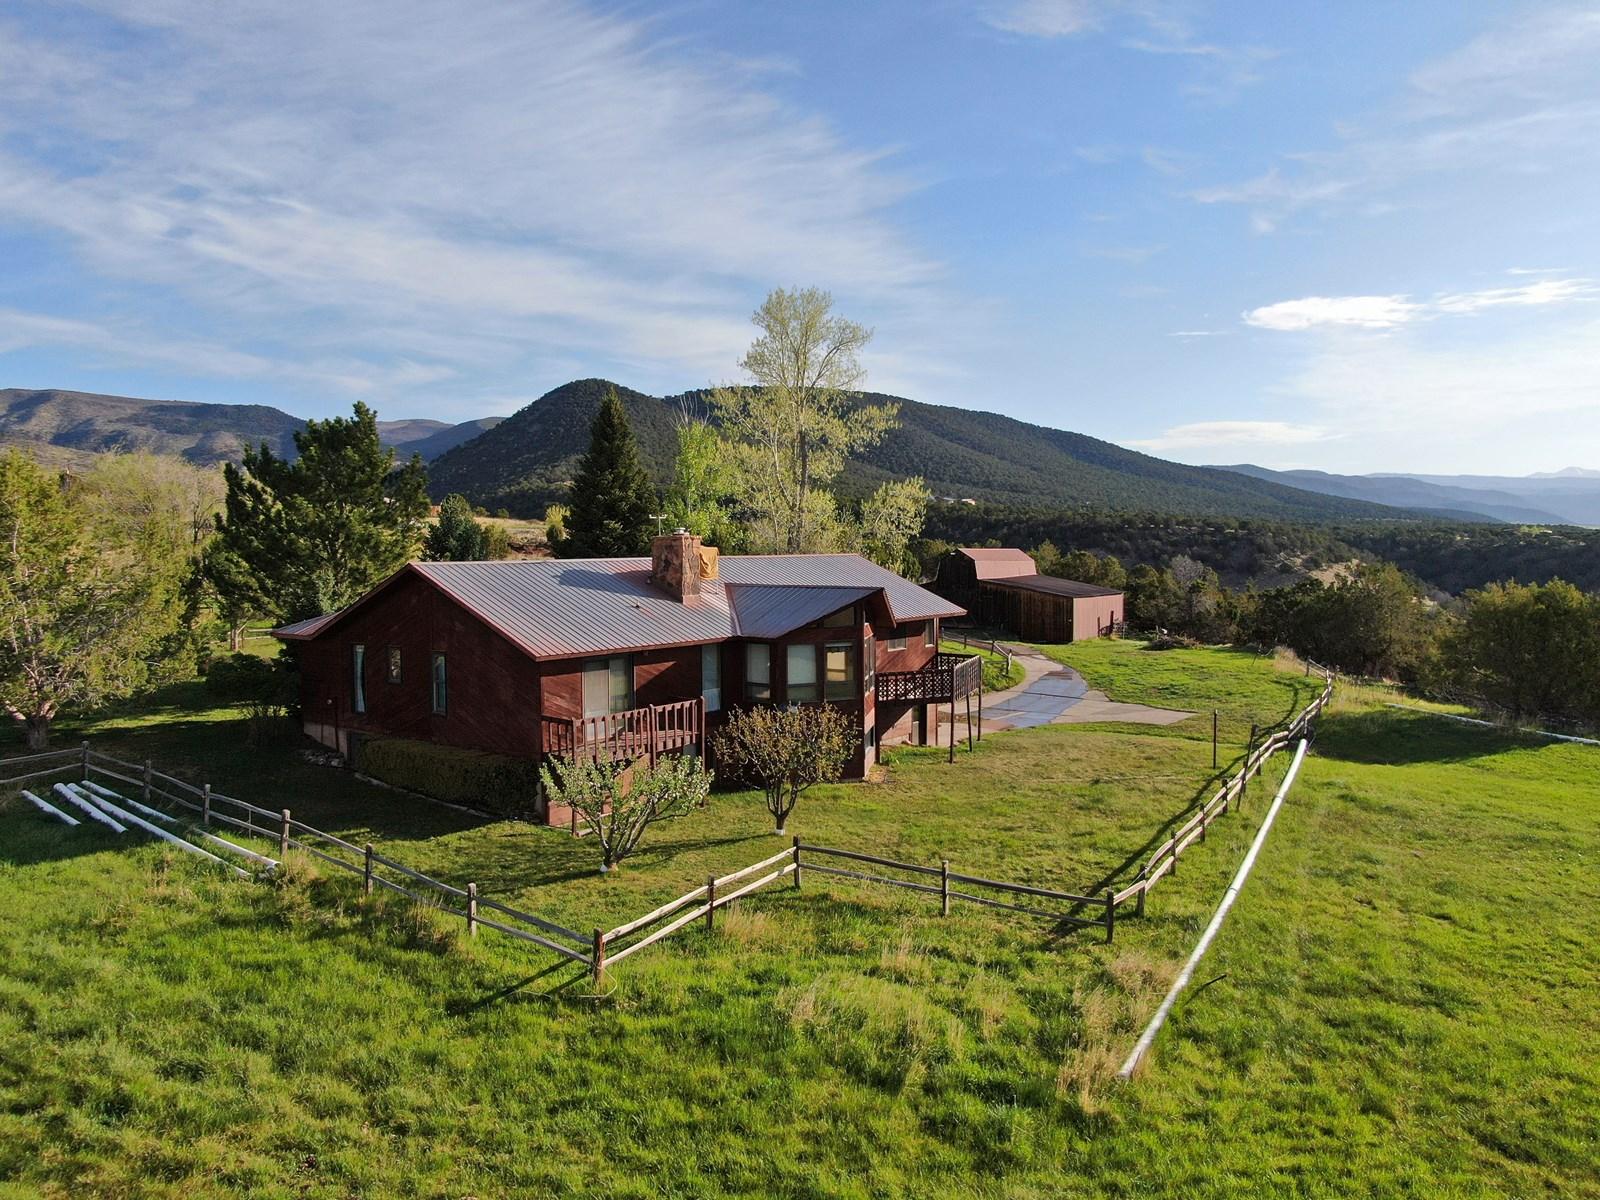 Colorado country home & horse property near Paonia, Colorado